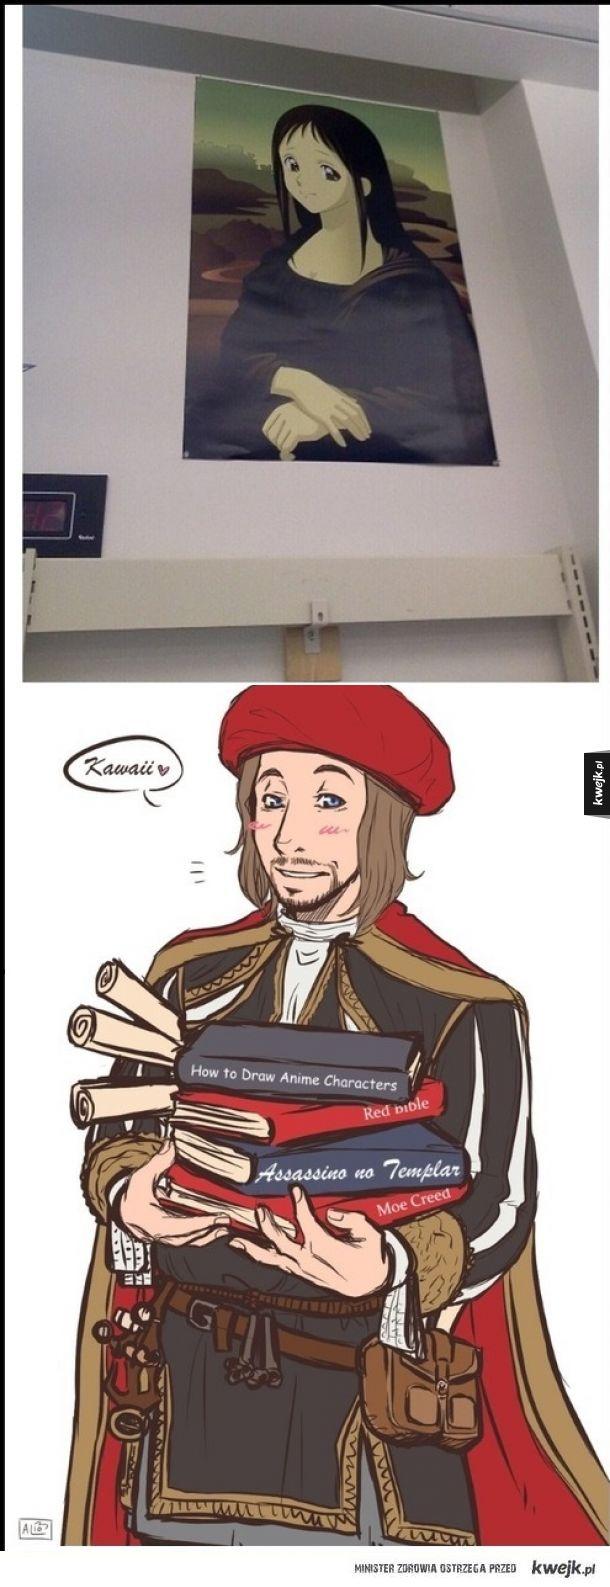 Moe Lisa wielkiego artysty Leonardo Doujinshi.